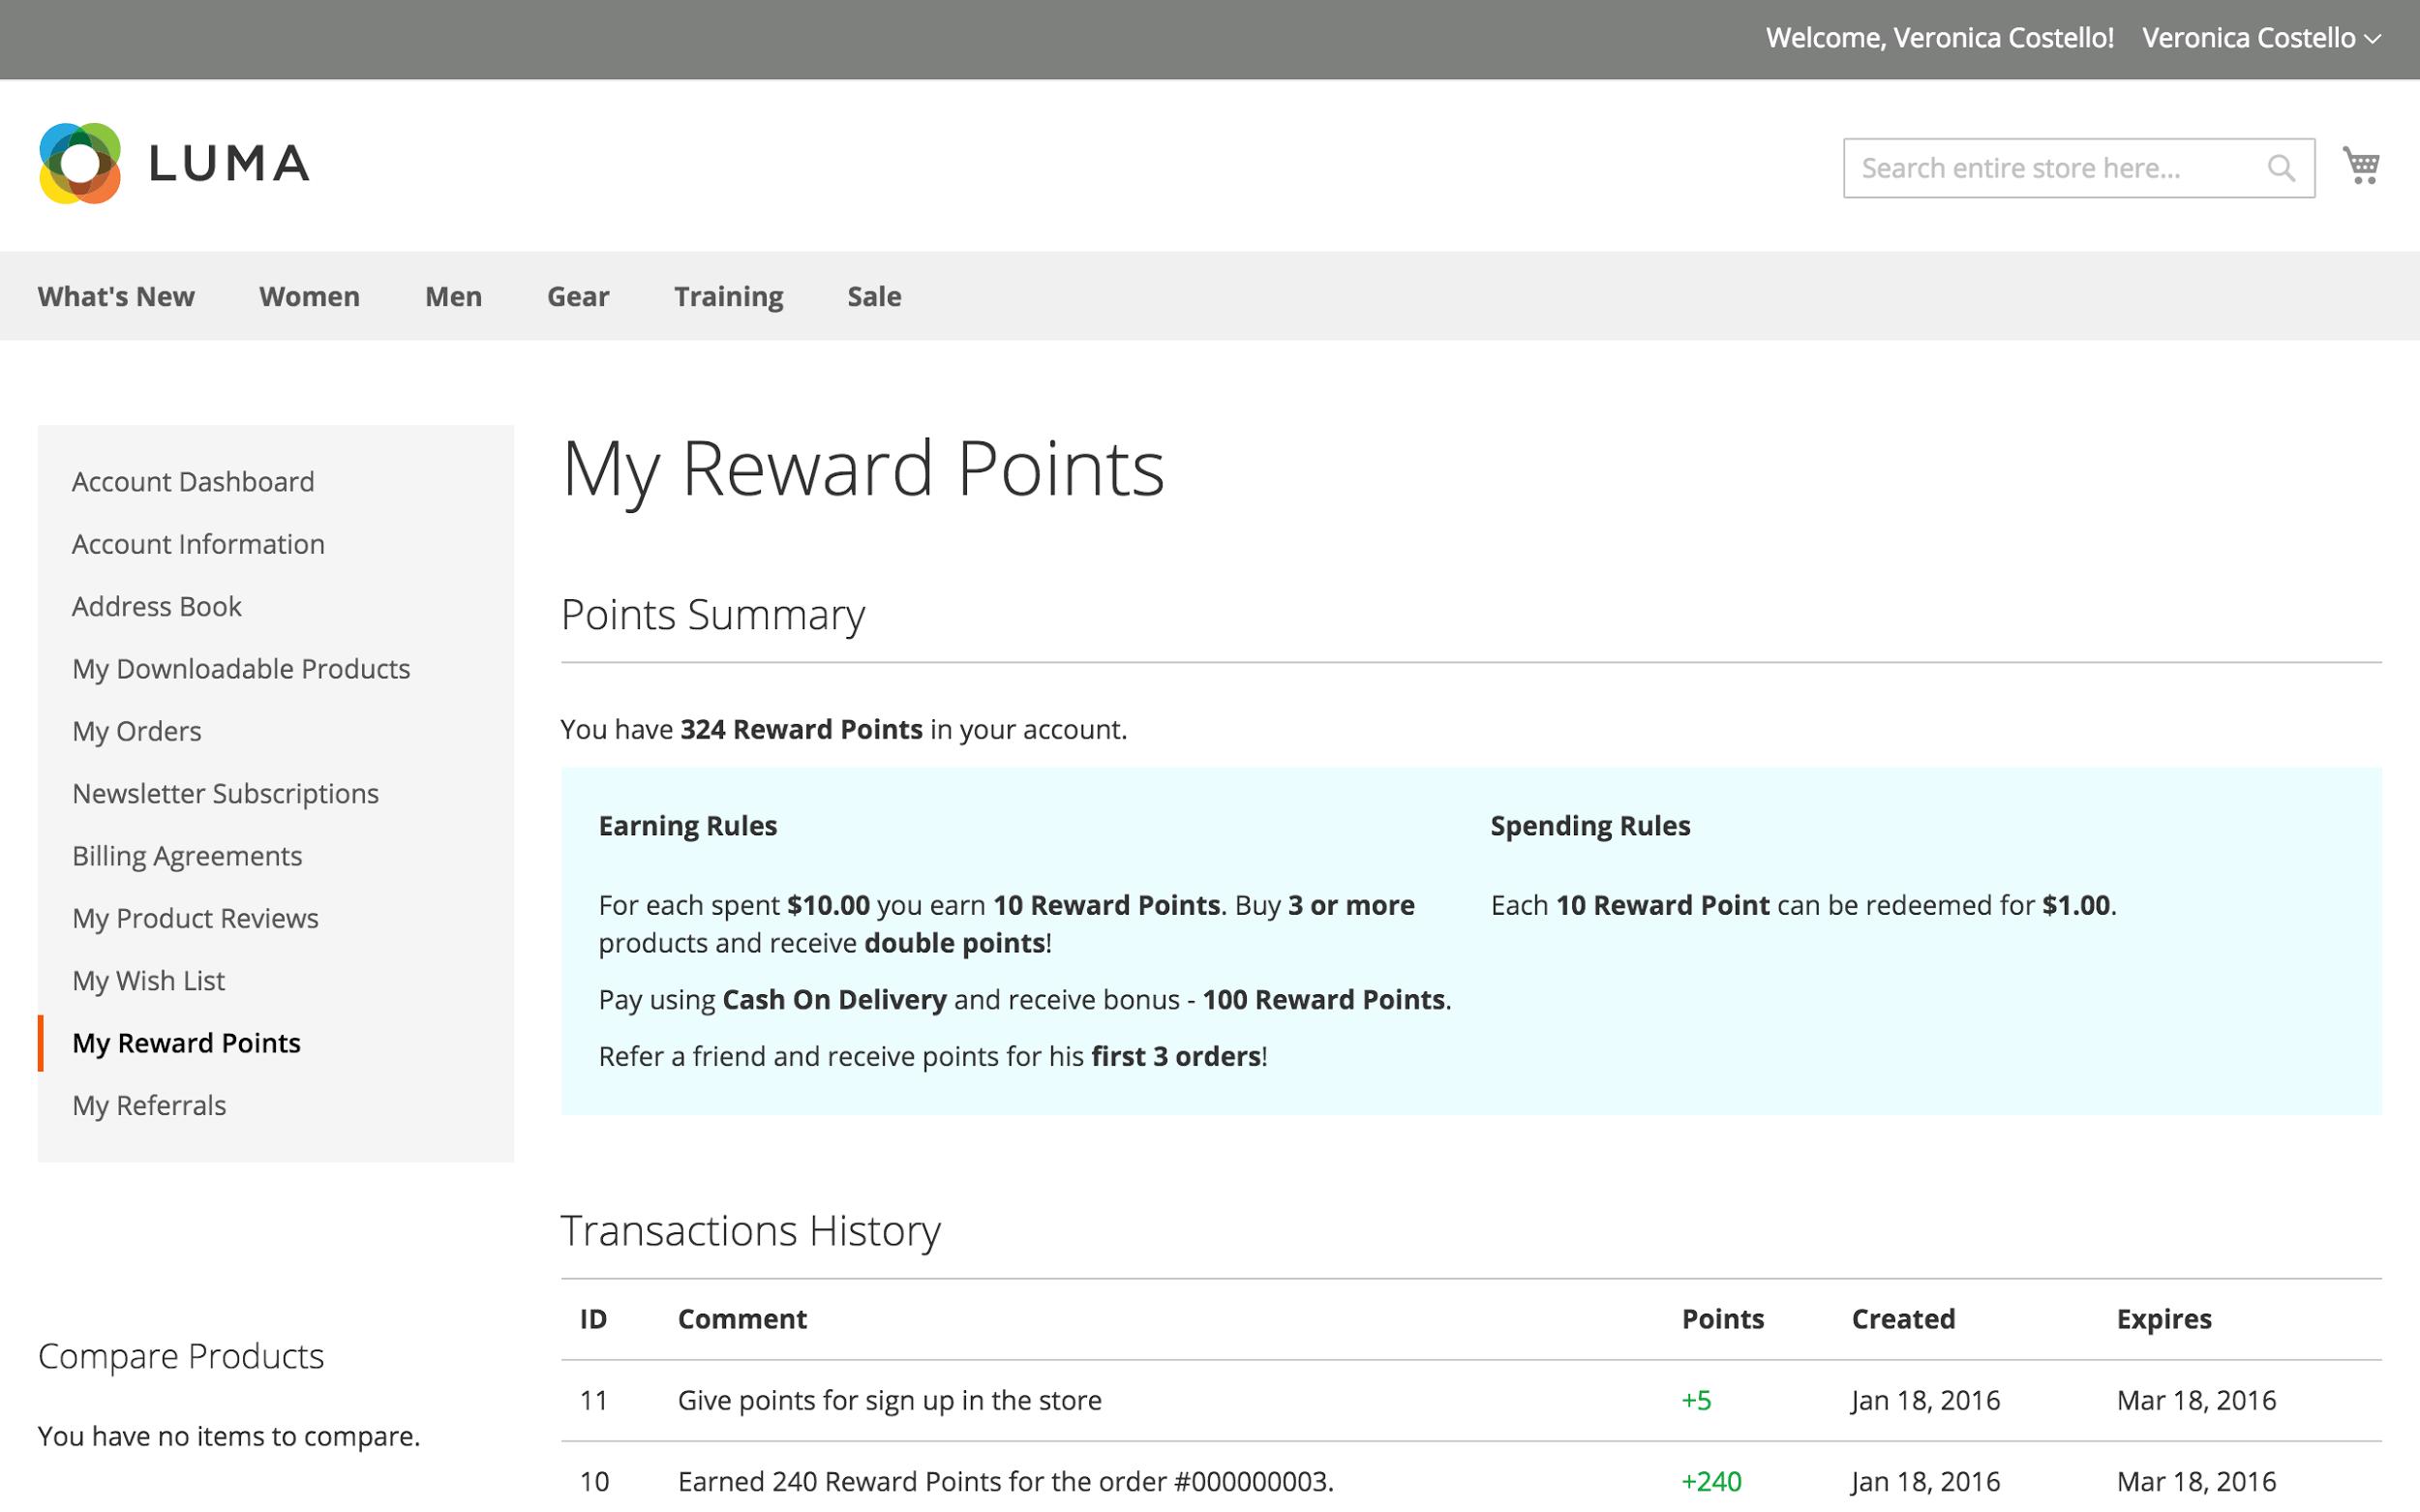 Reward points dashboard in customer's account interface.